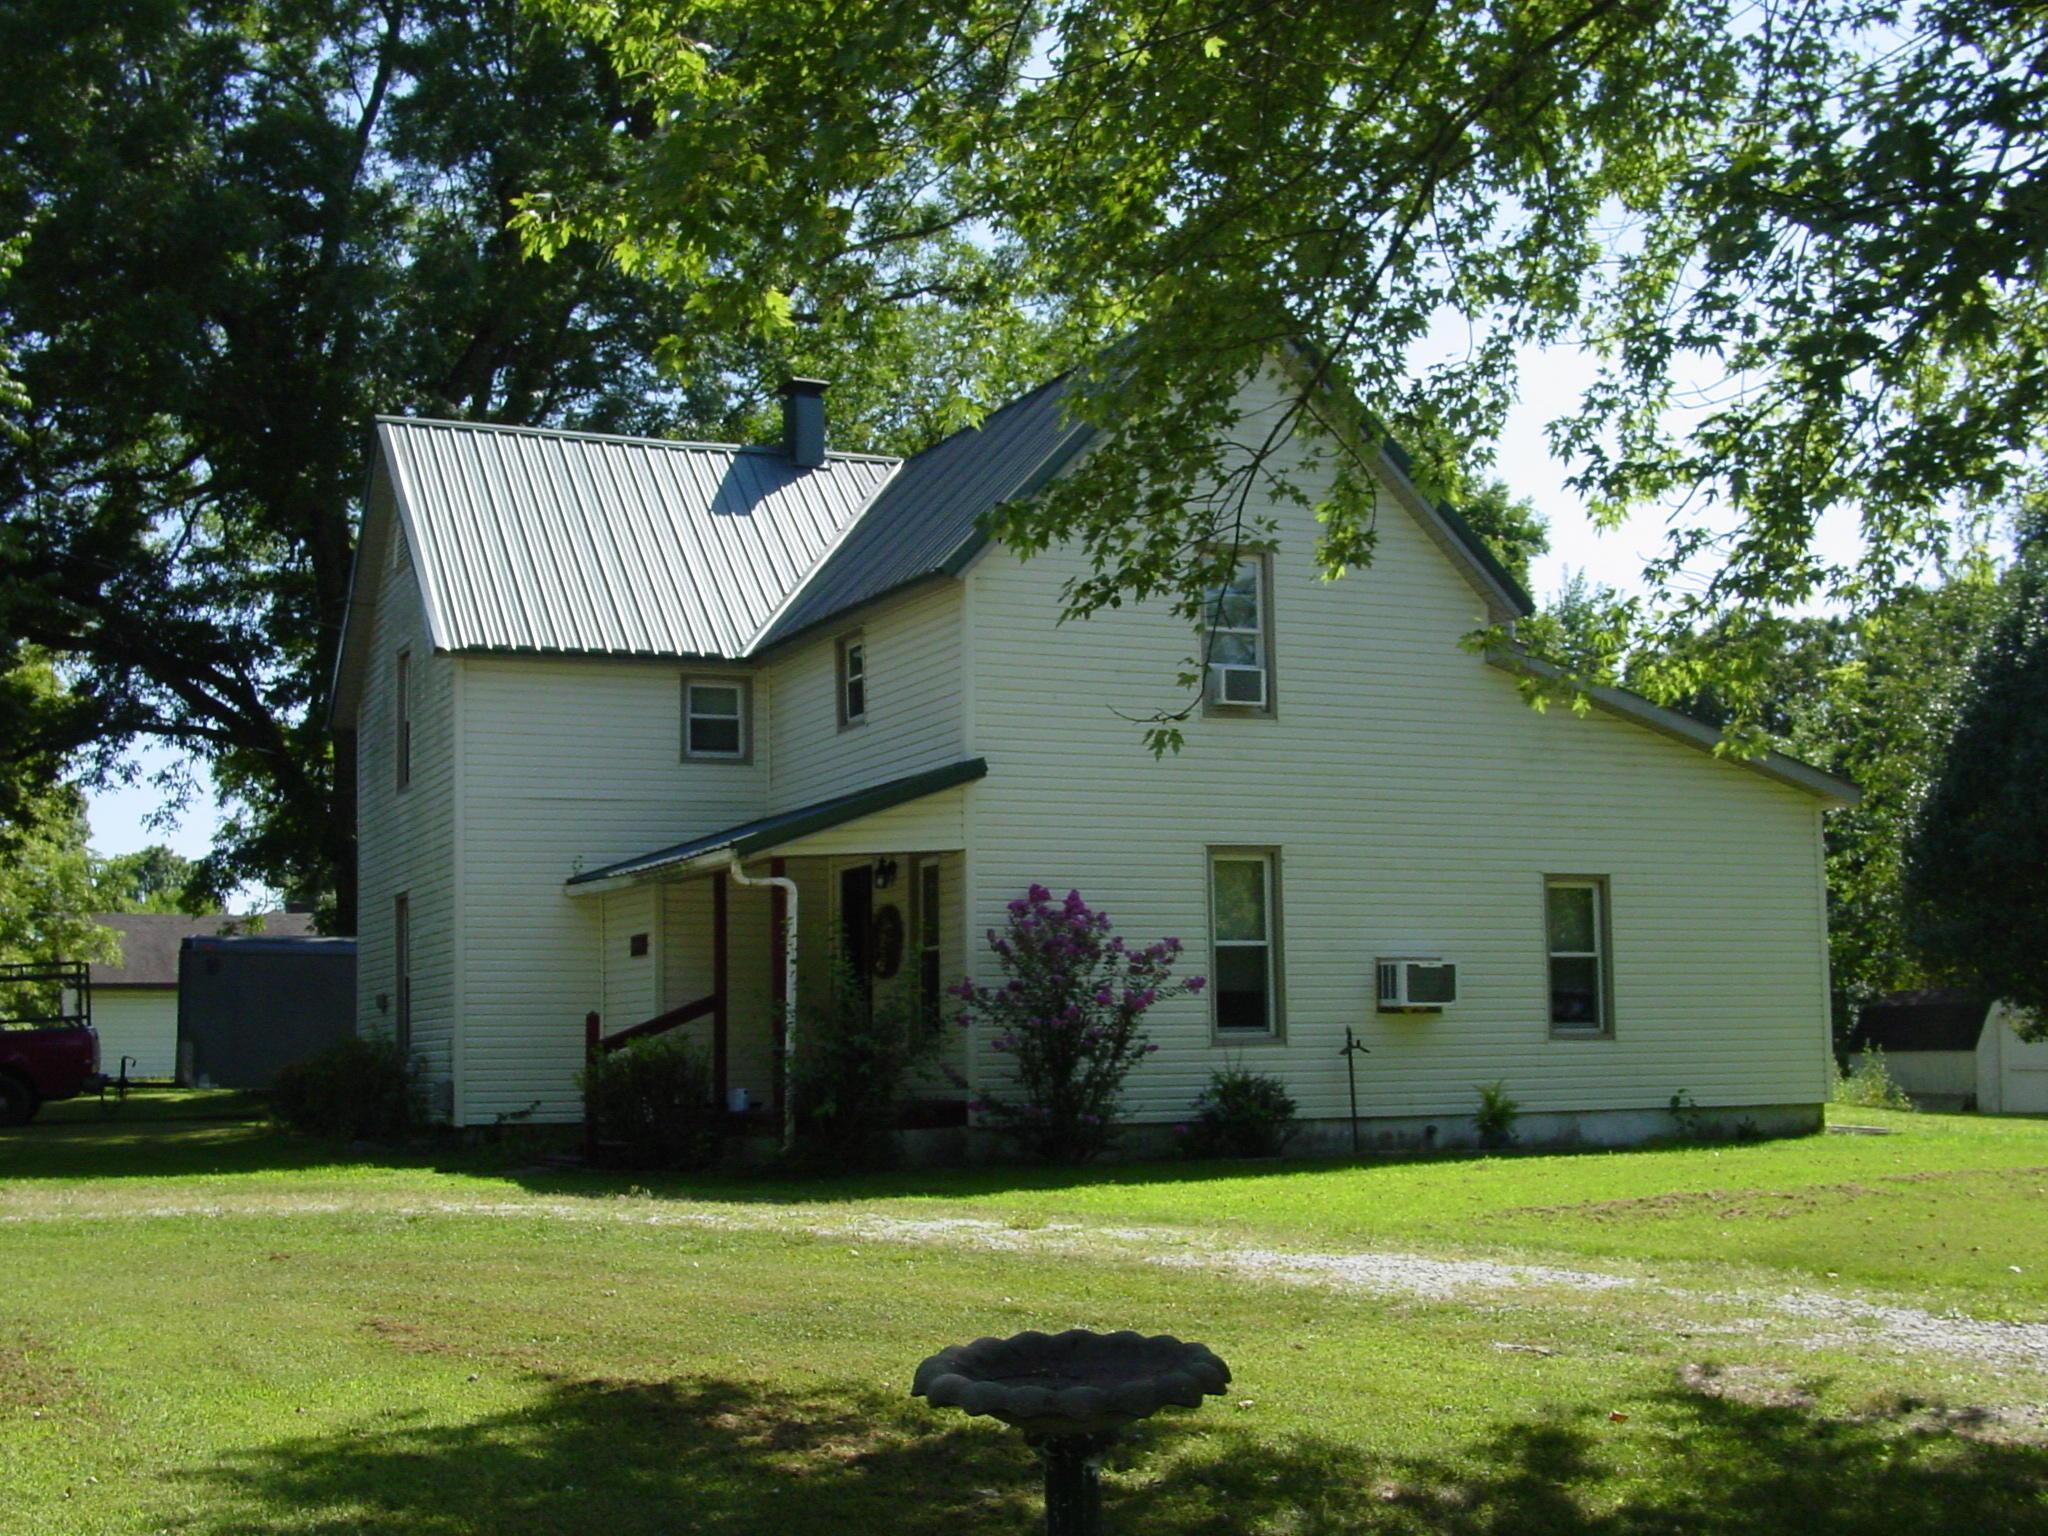 605 South Hemphill Avenue Crane, MO 65633